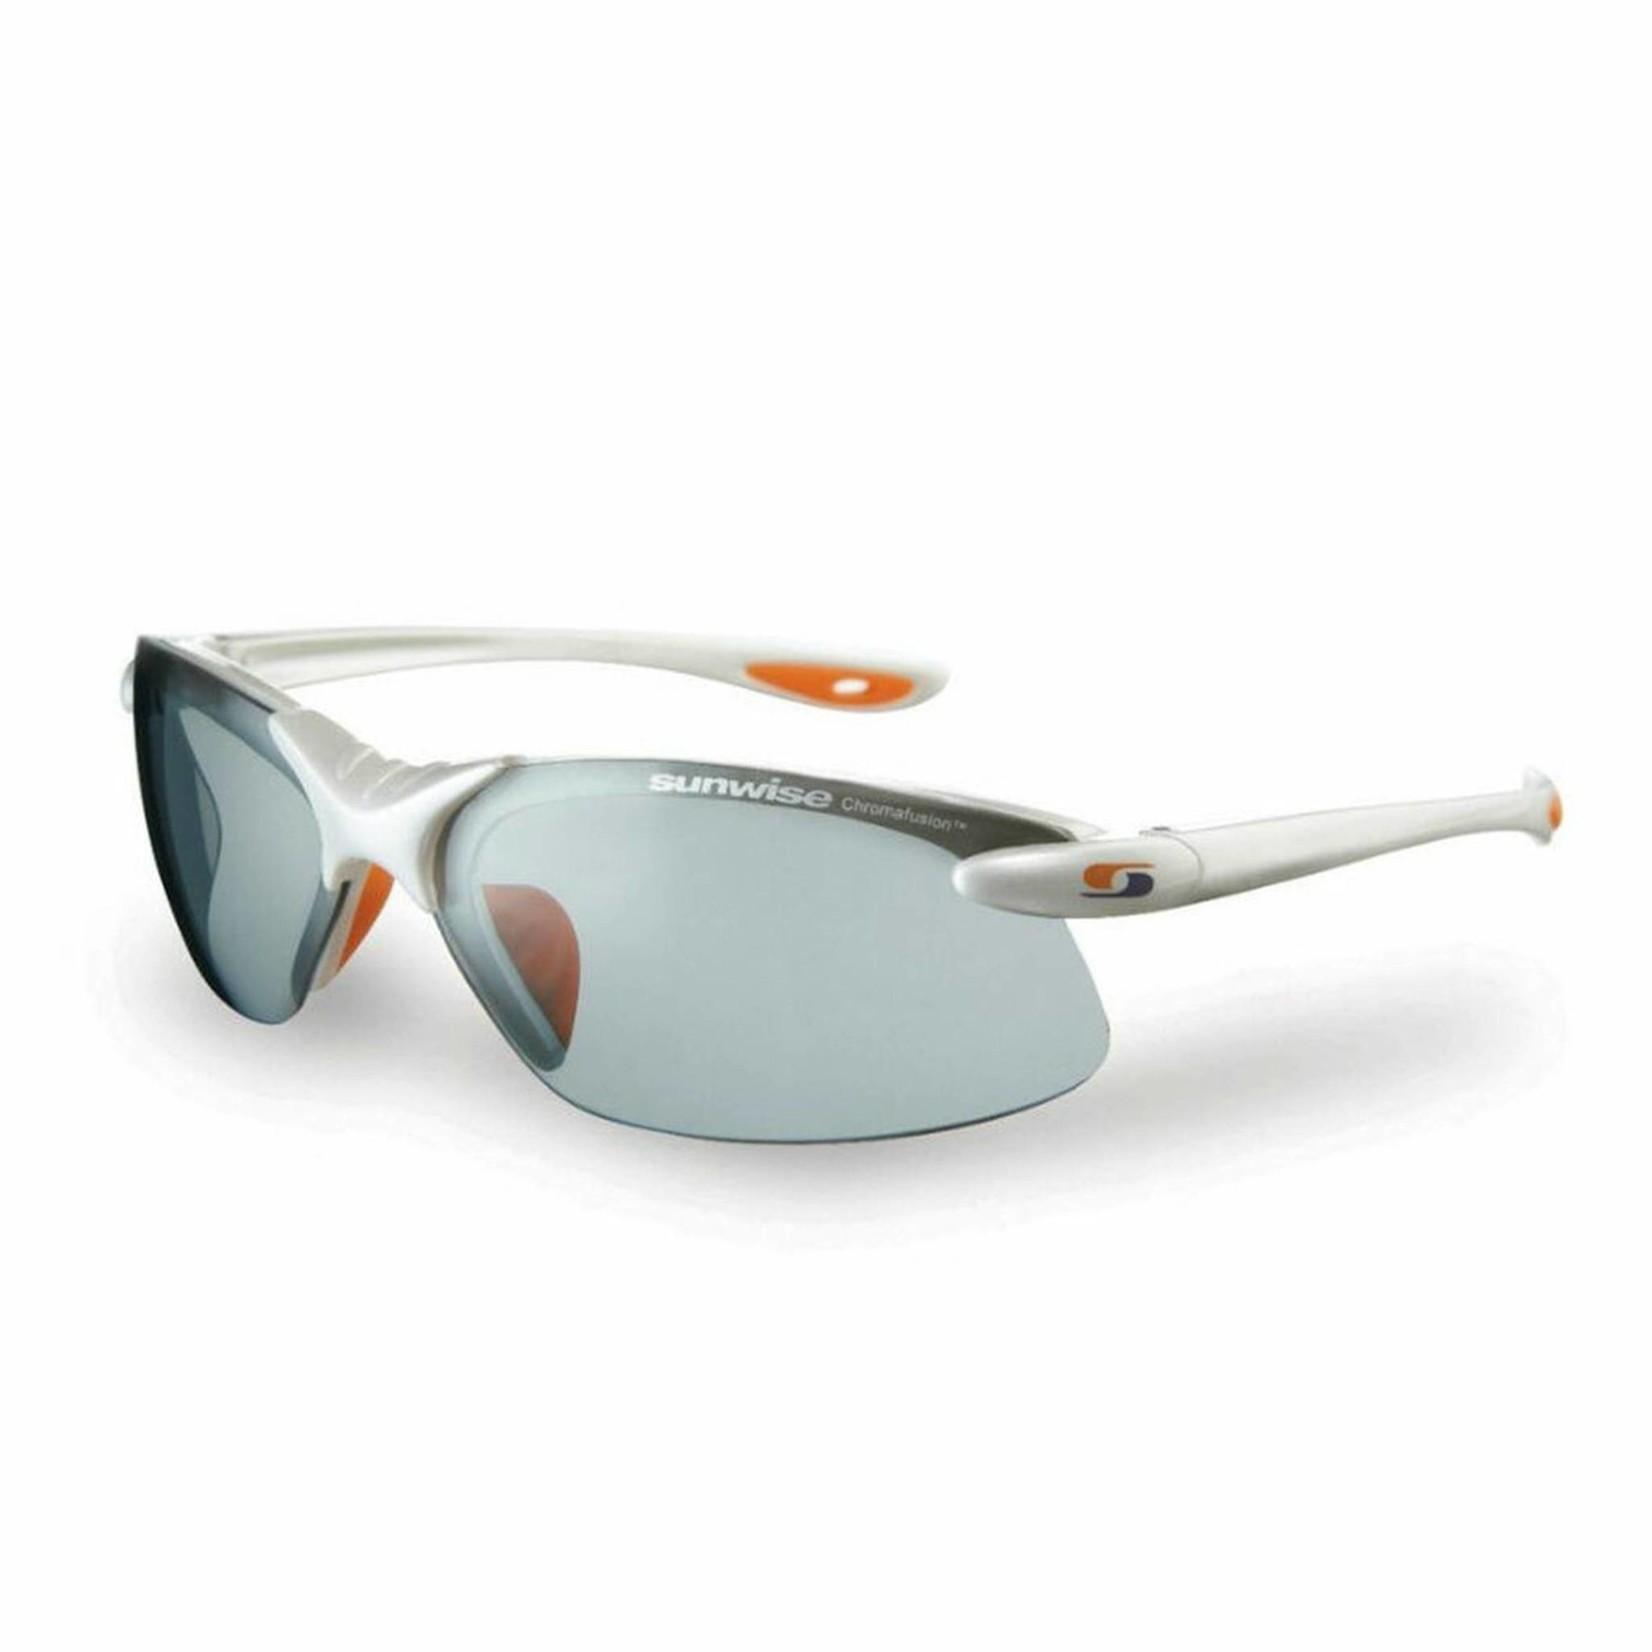 Sunwise Waterloo Photochromic Sunglasses White